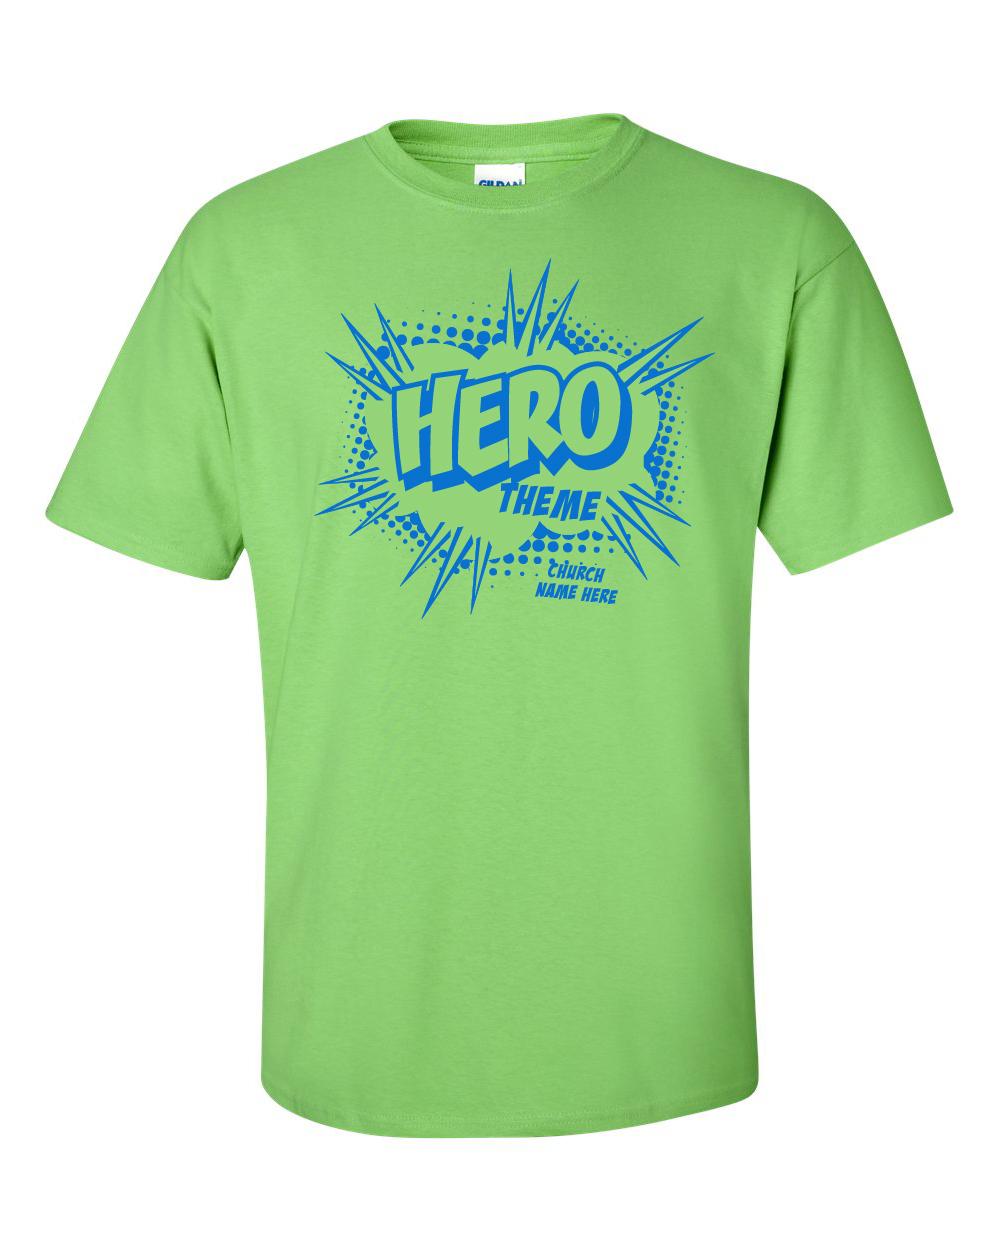 Hero 2-03.jpg